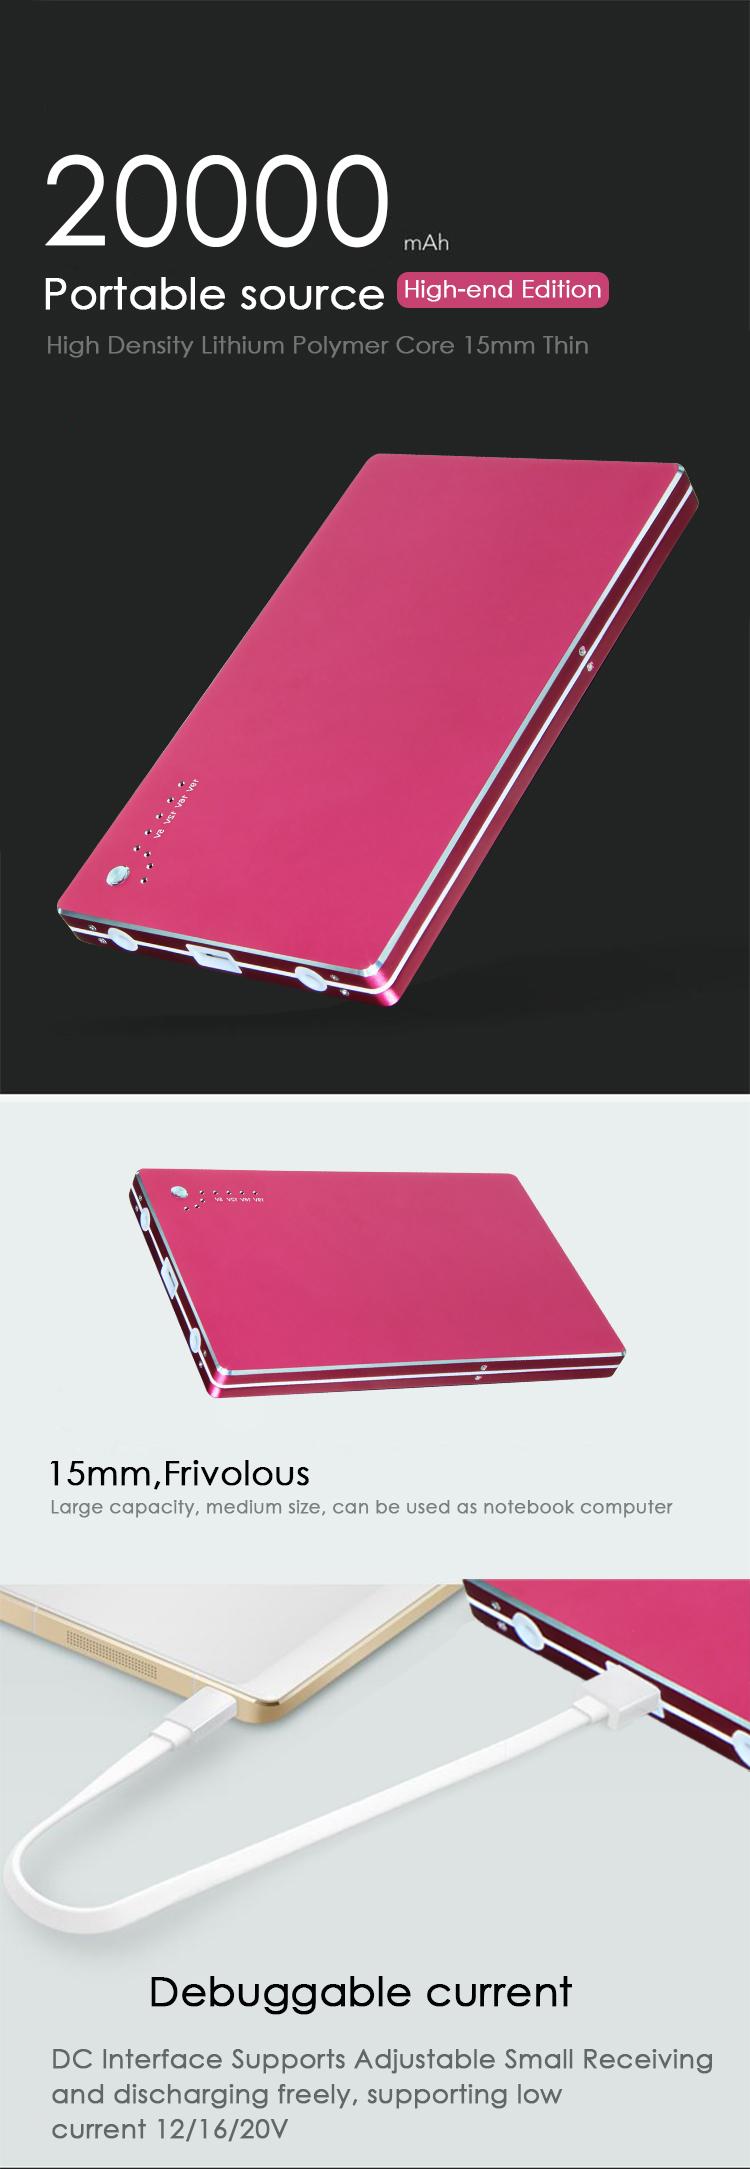 Kapasitas Tinggi 20000 MAh Charger Laptop Power Bank untuk Notebook, Portable Charger 20000 MAh Power Bank